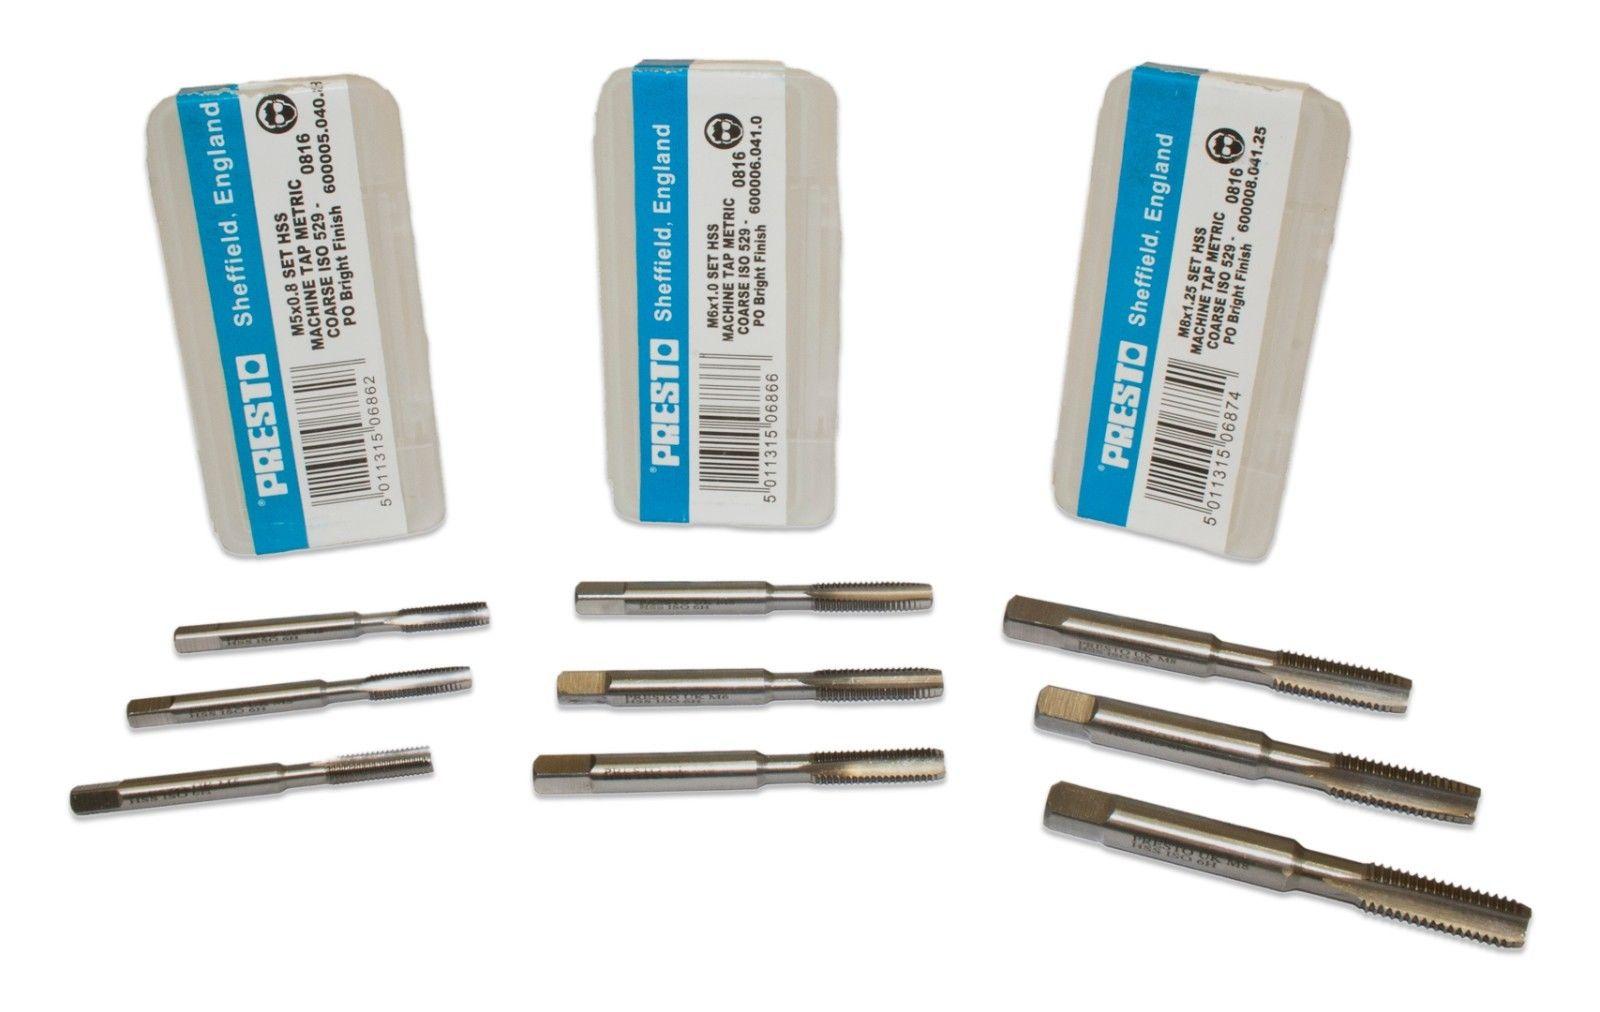 4 Flutes Rocky Mountain Twist 95101054 High Speed Steel Plug Metric Hand Tap D4 H-Limit M5-0.8 Size